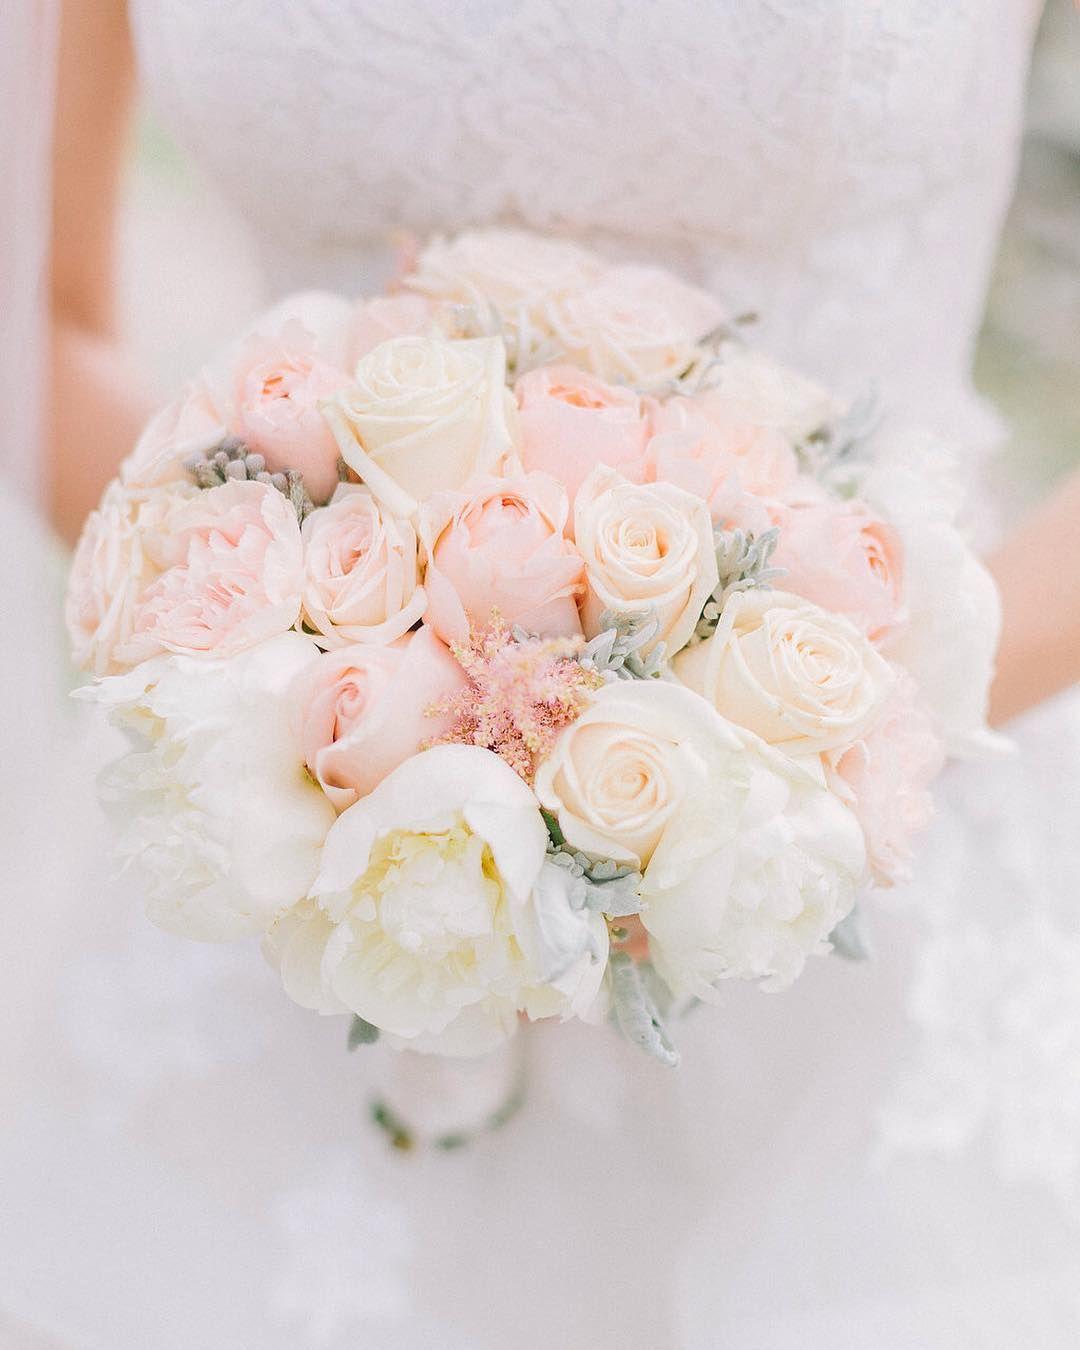 awesome vancouver wedding Incredible shot of bridal bouquet by talented @kimjamesphotography ! #vancouverflorist #vancitybuzz #vancitywed #brockhouse #sunflowerflorist #dustymiller #peony #peonybouquet #garden #brockhouserestaurant #weddingideas by @vancouverflower  #vancityweddings #vancouverflorist #vancouverwedding #vancouverweddingvenue #vancouverwedding